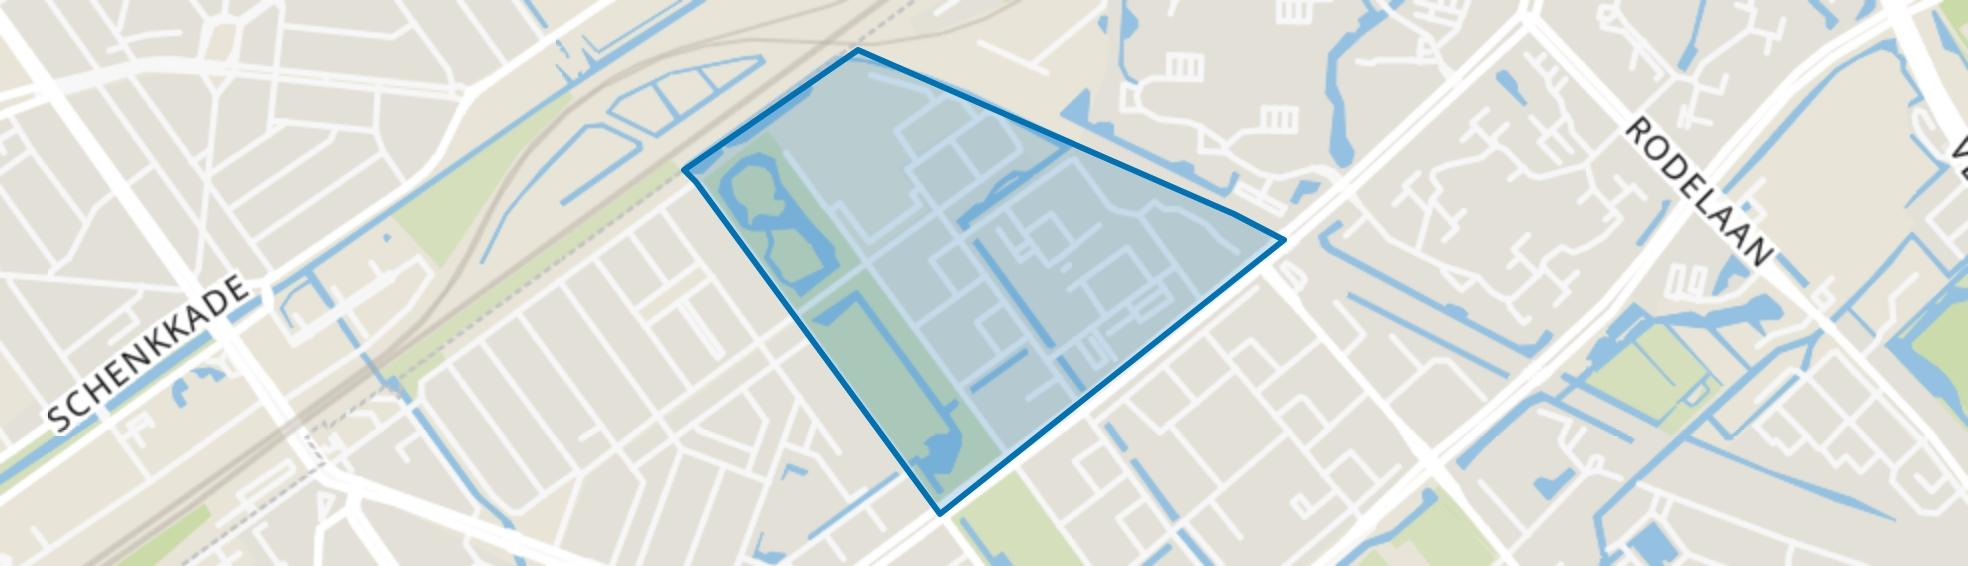 Bovenveen noord, Voorburg map